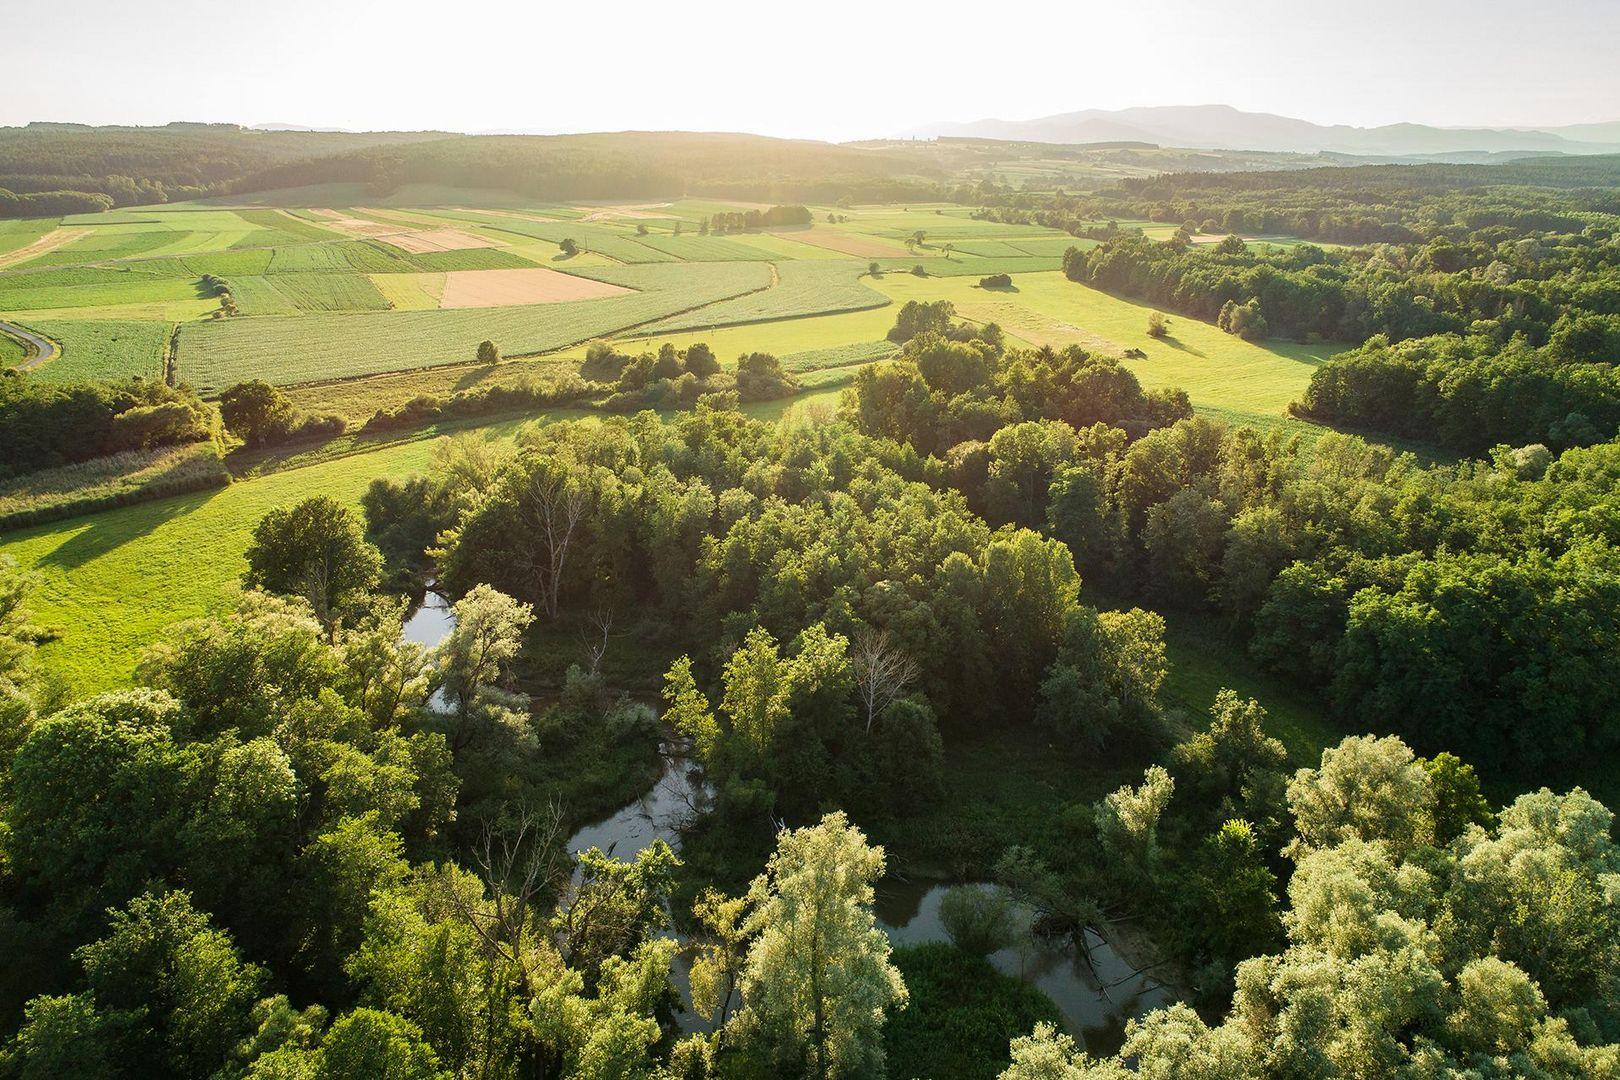 Fotogalerie - Ramsar Schutzgebiet 1